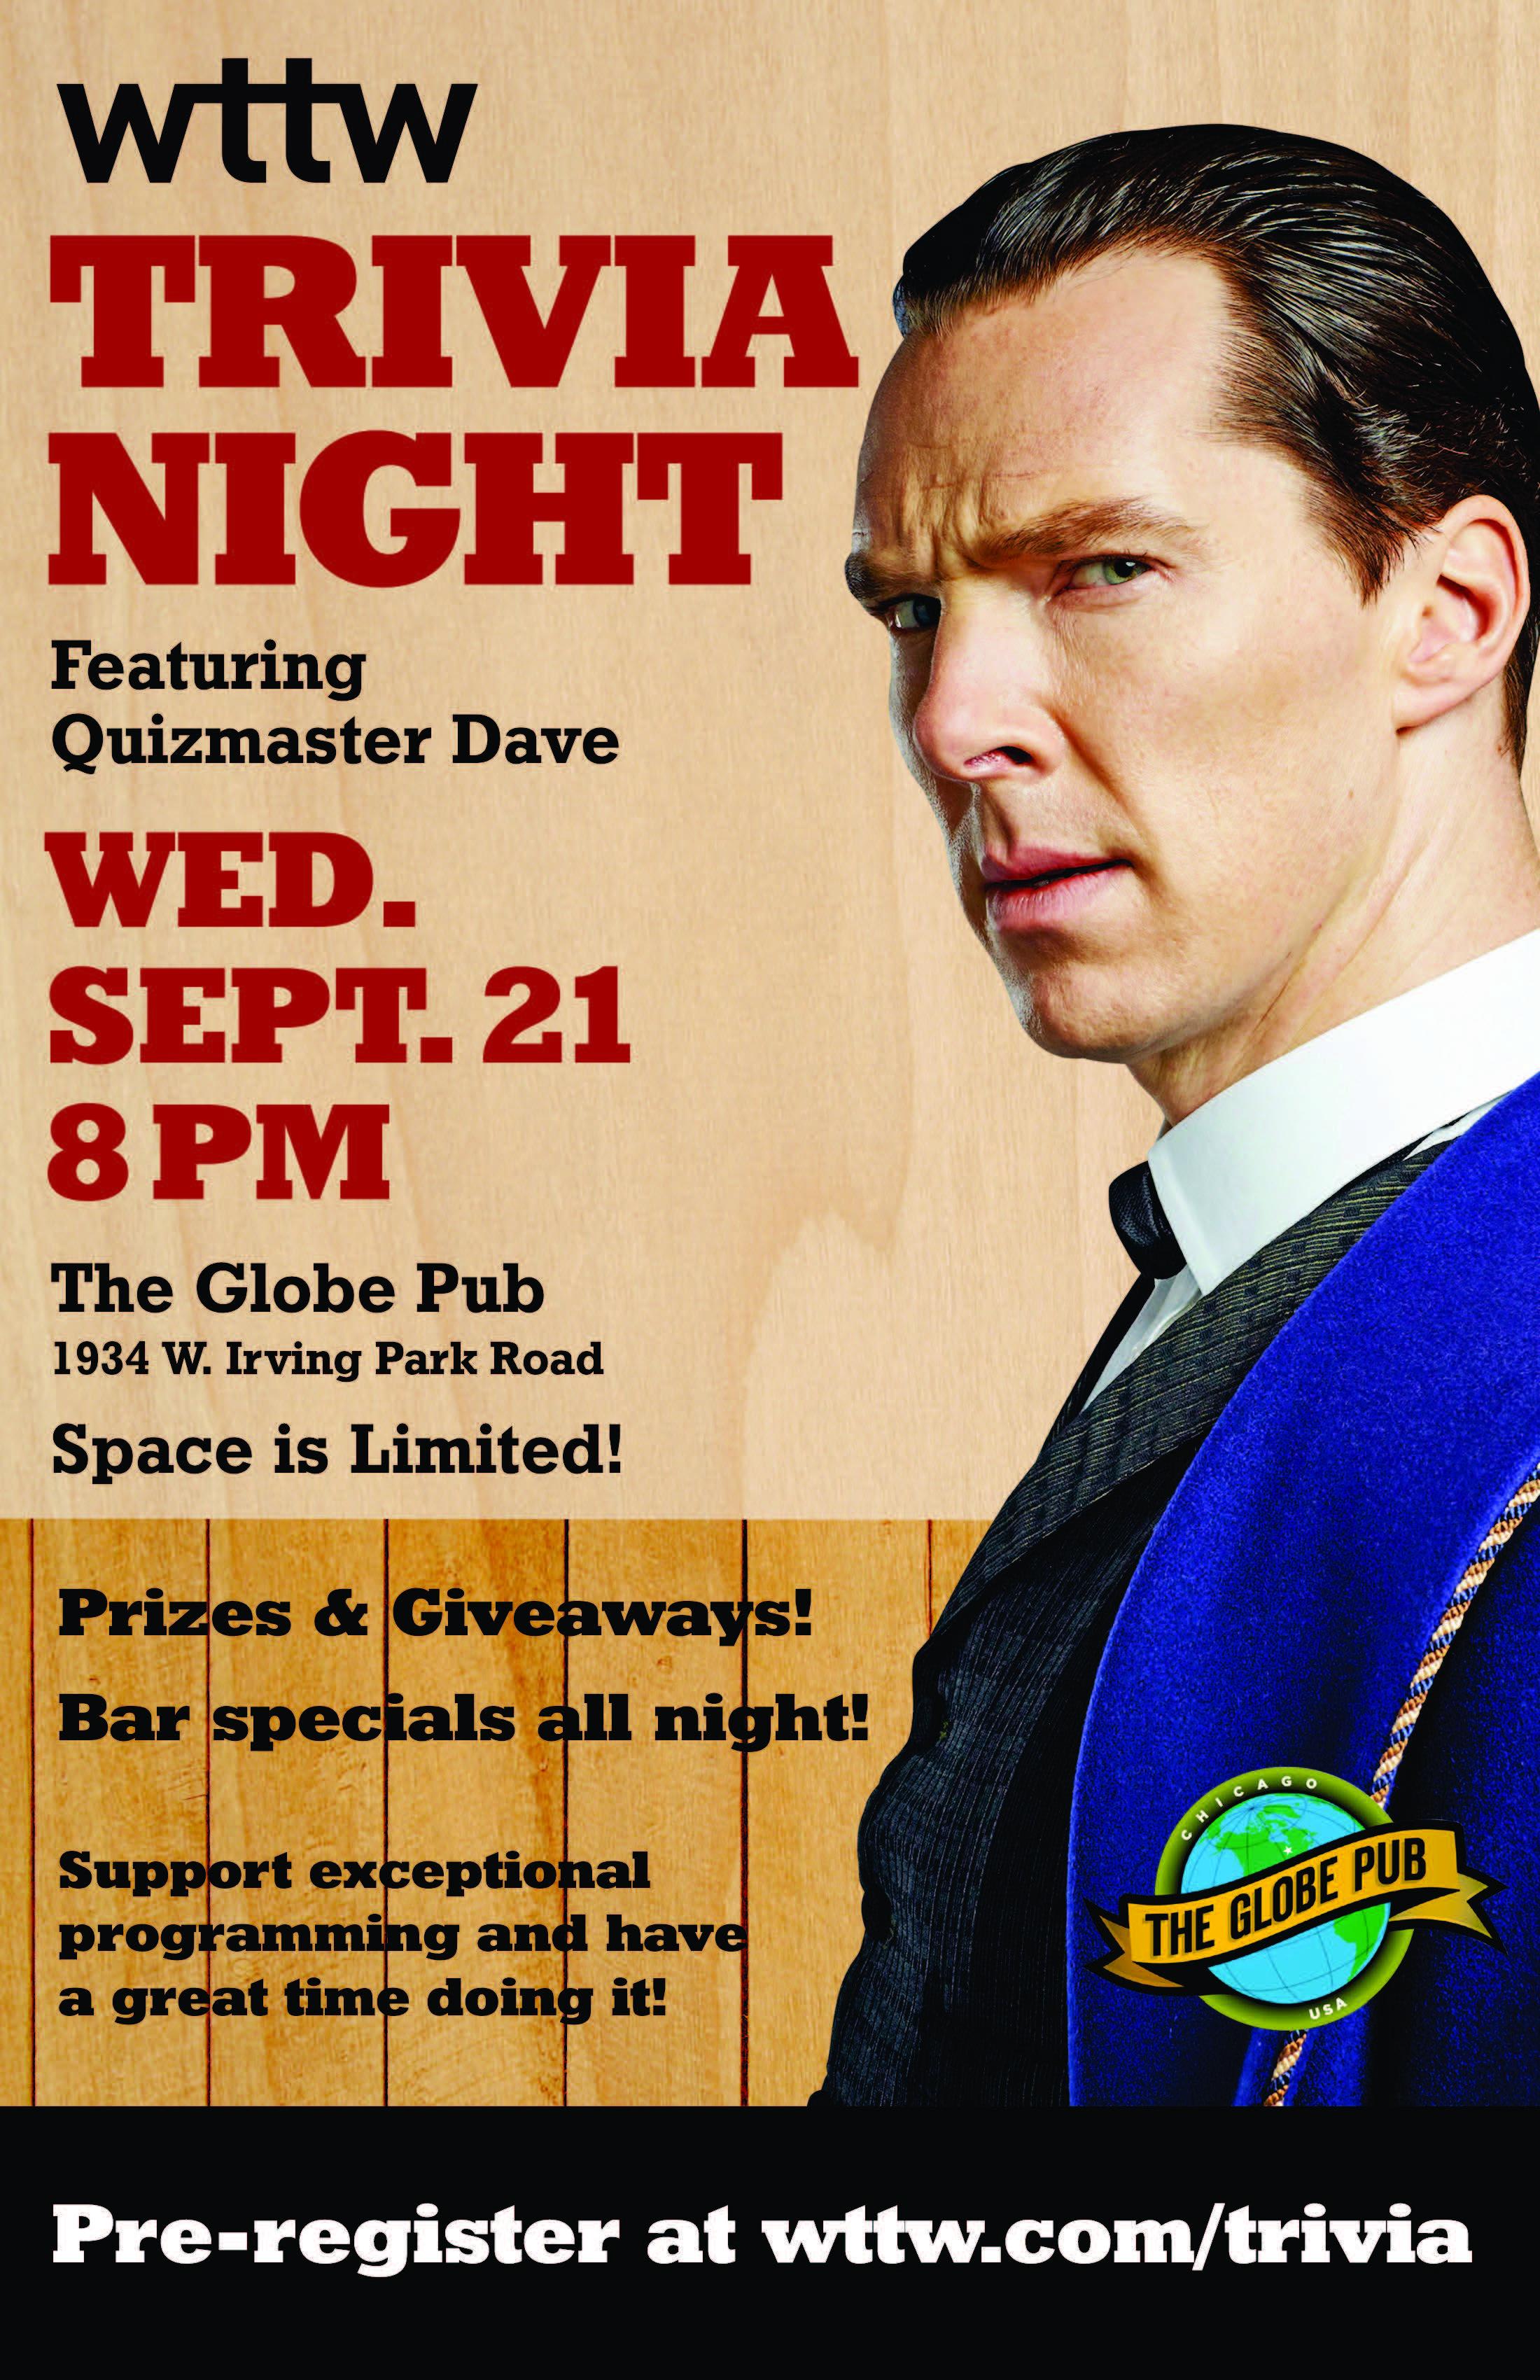 WTTW_trivia night poster_082616